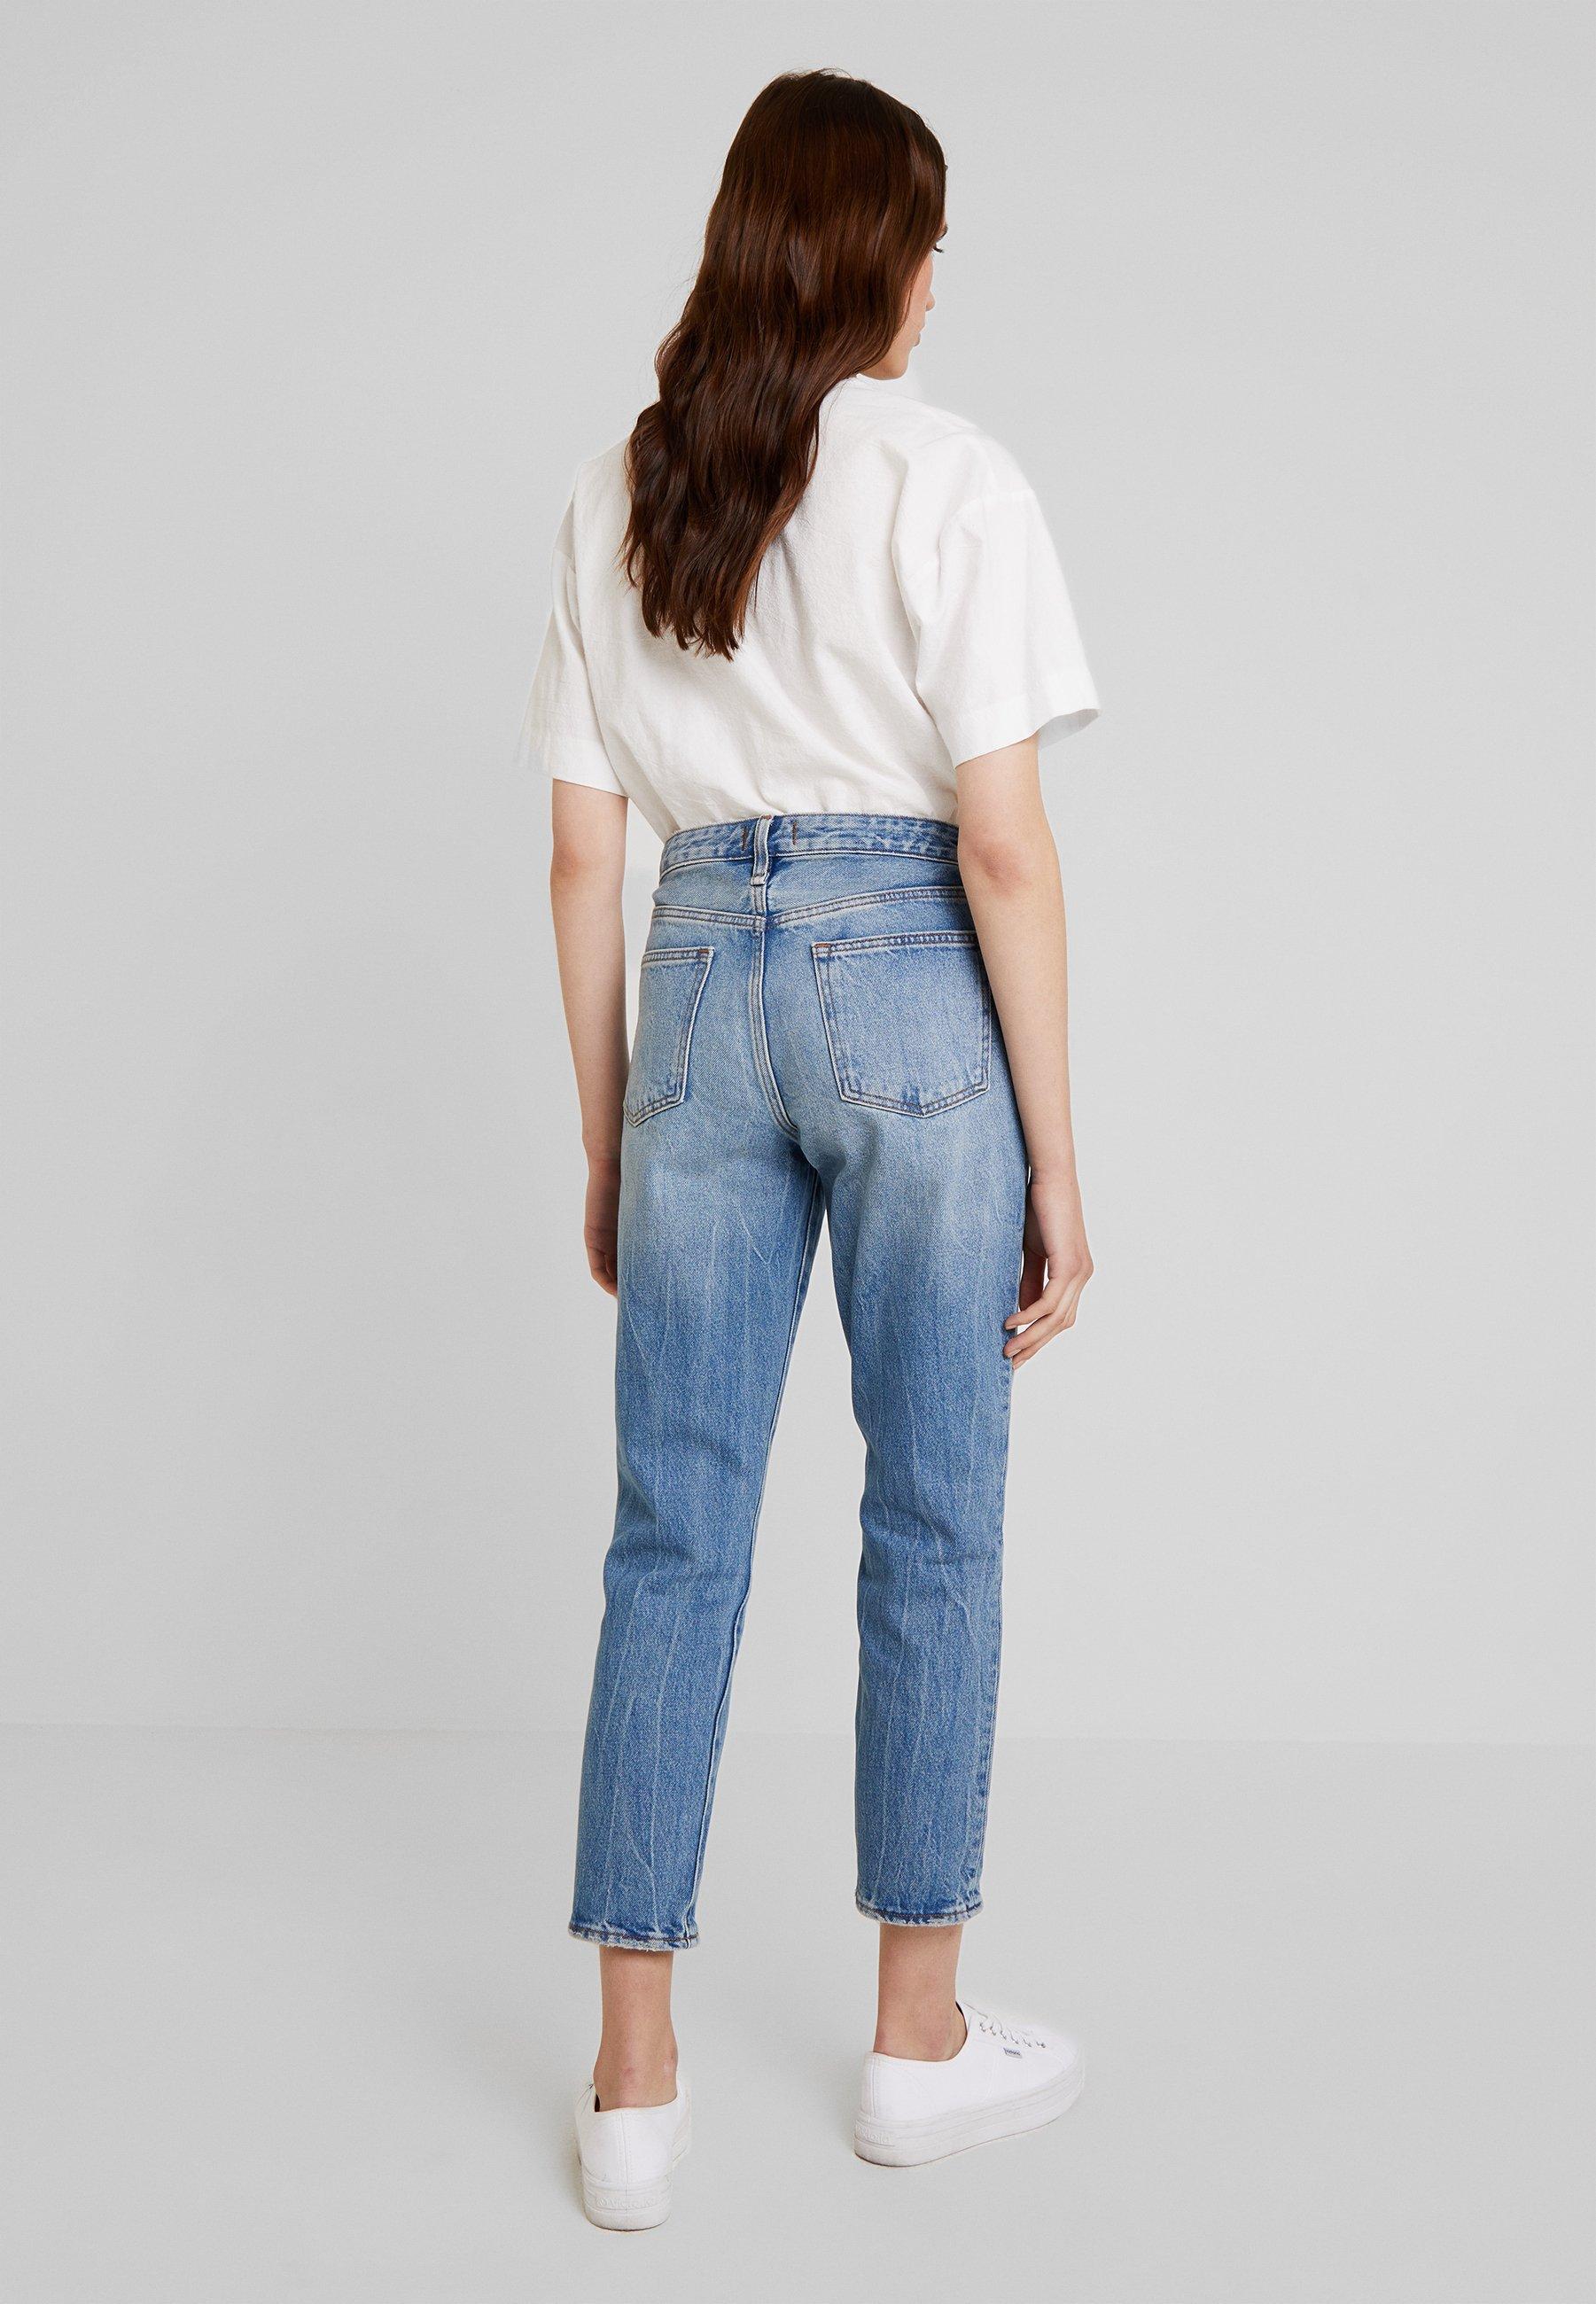 Abercrombie & Fitch SLIM BOYFRIEND - Jeans baggy medium